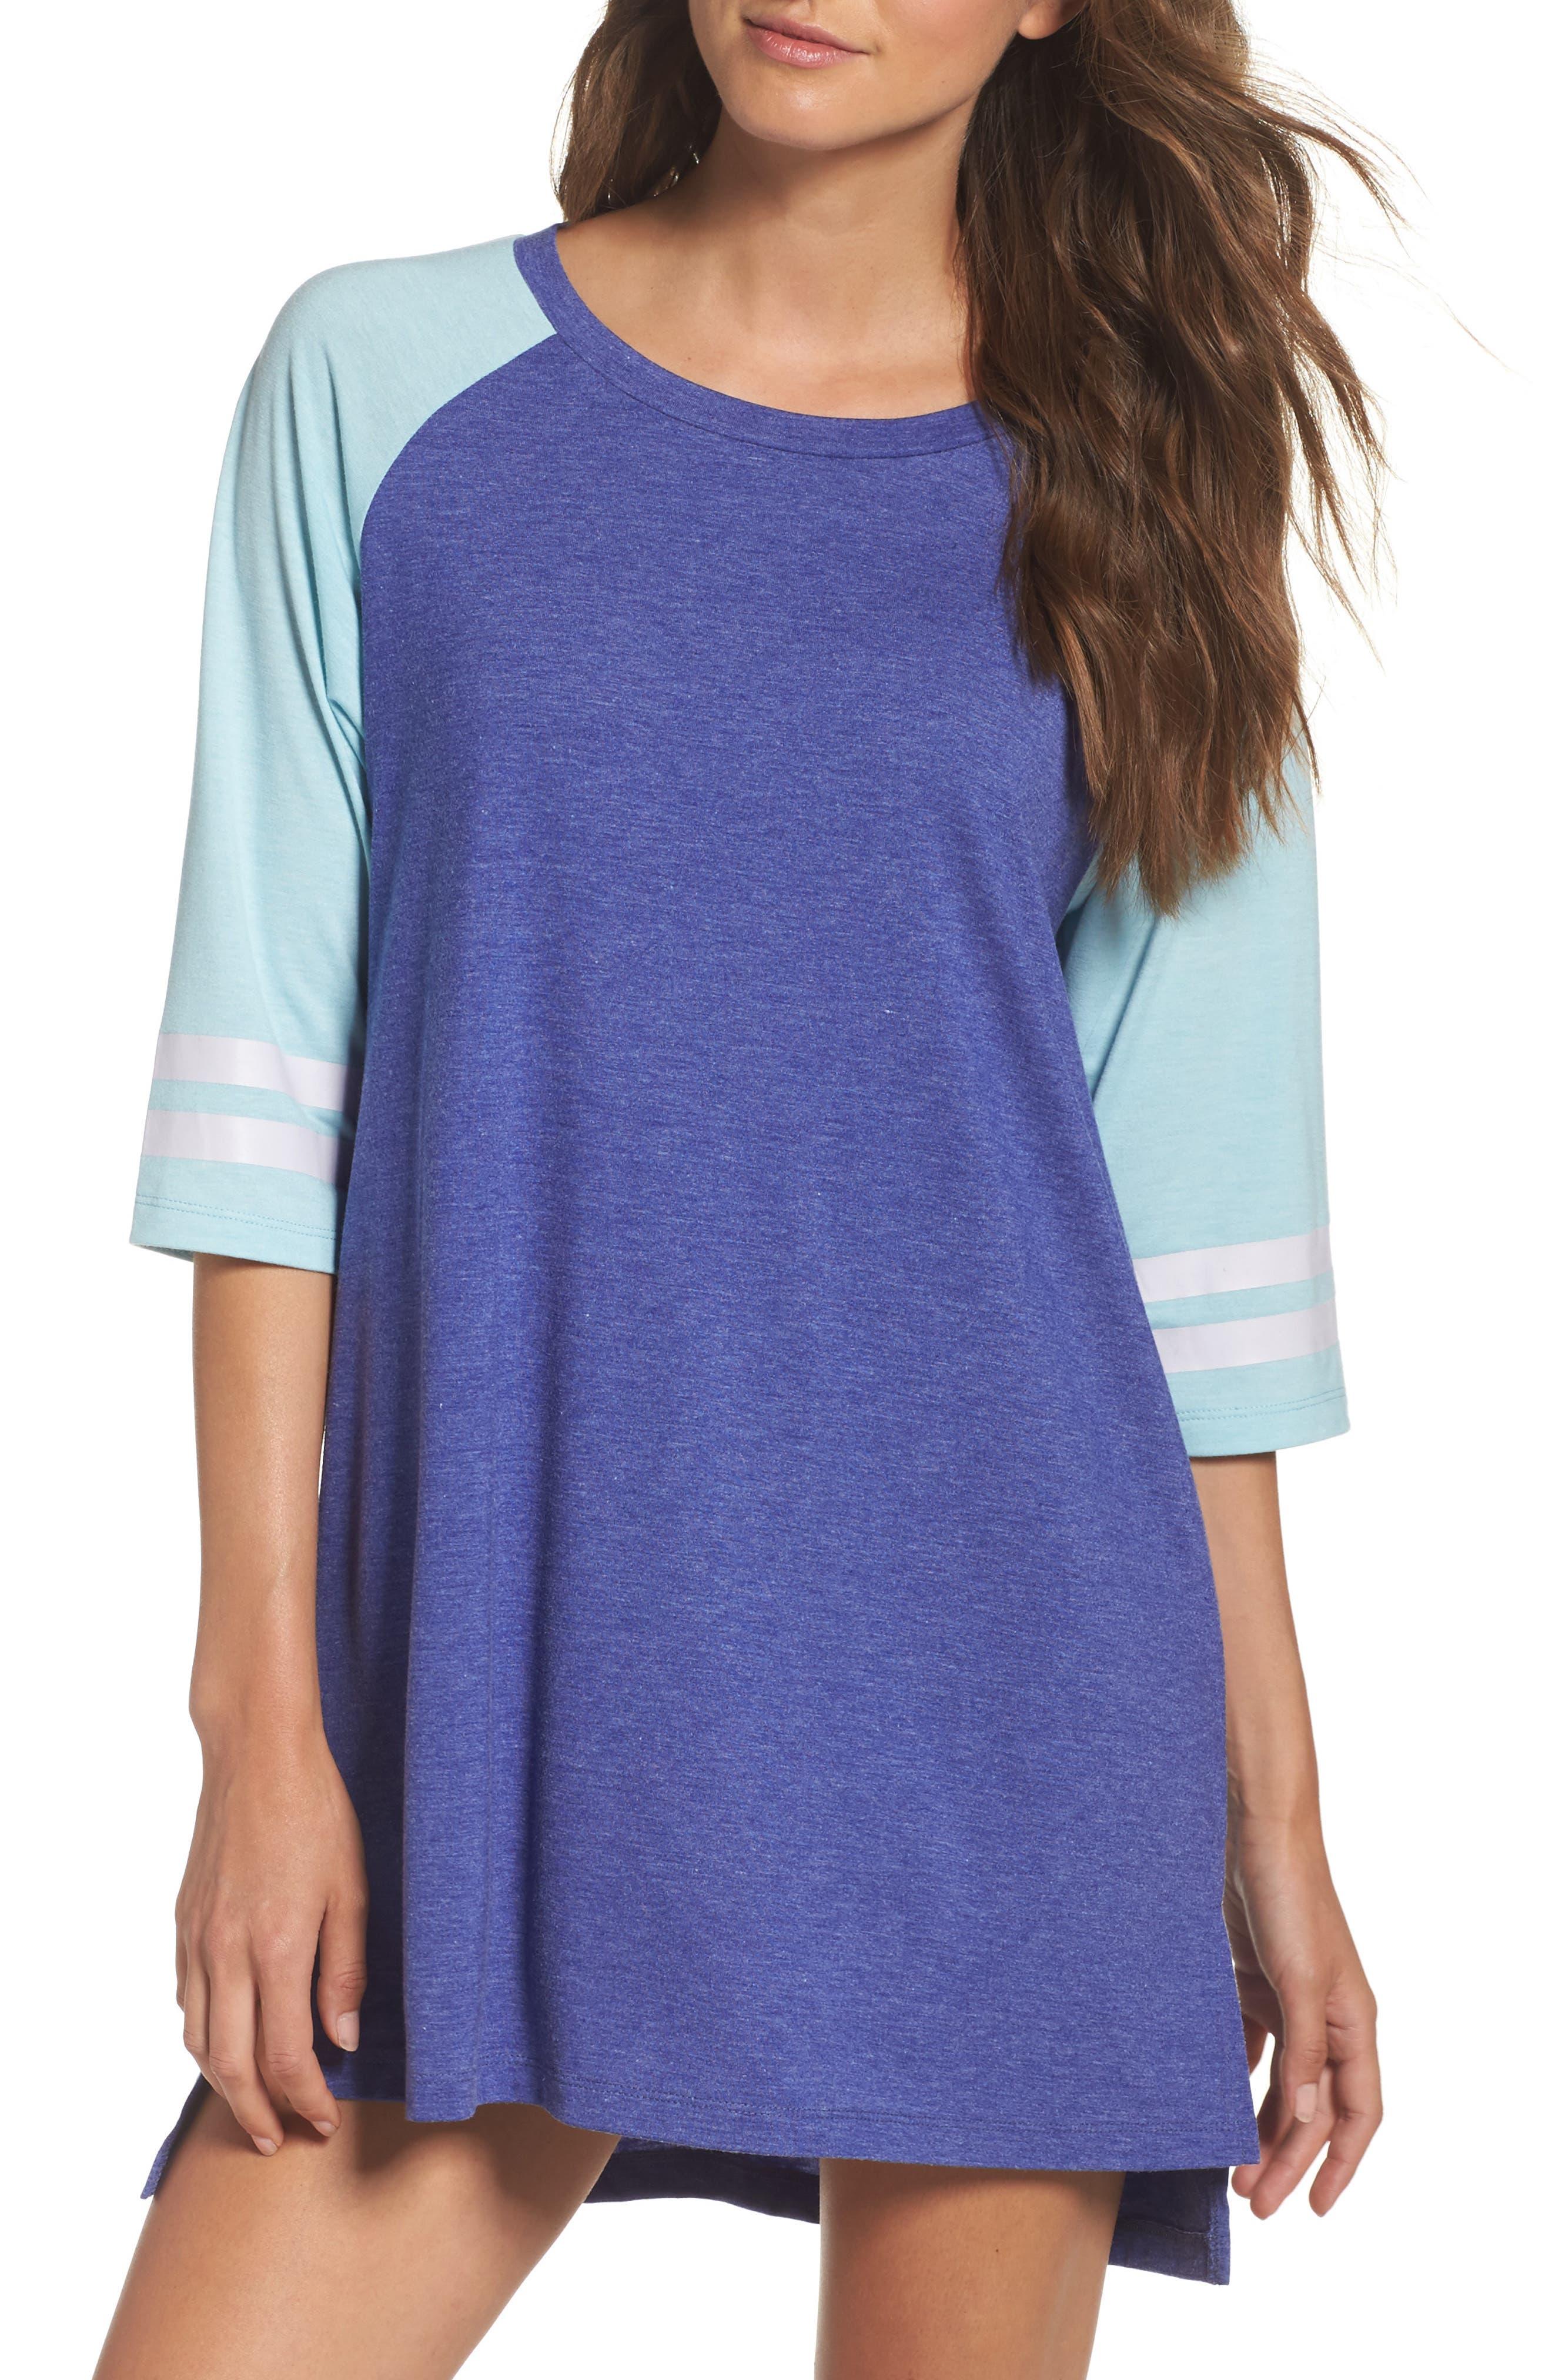 Honeydew Modal Jersey Sleepshirt